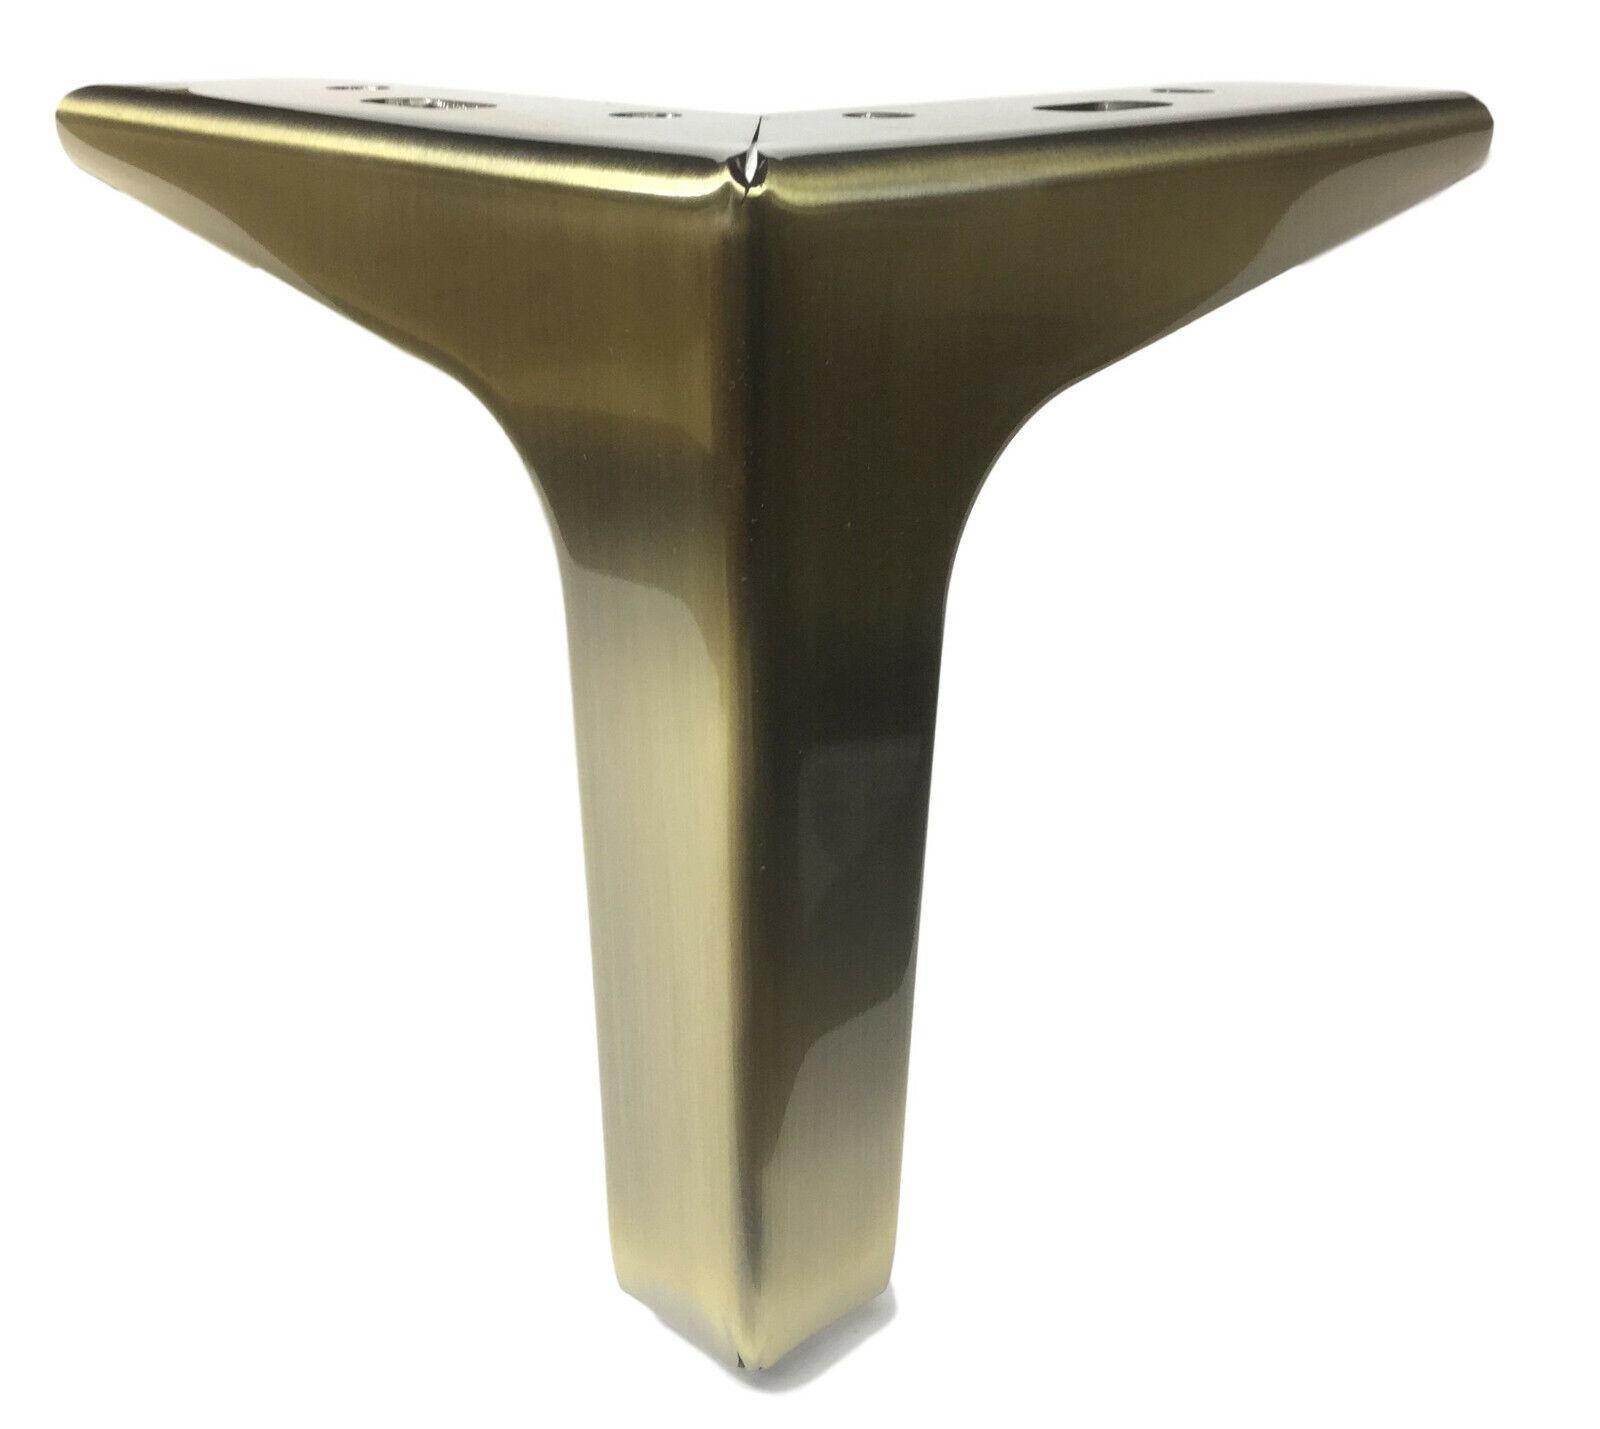 5″ Brushed Brass Finish Straight Metal Furniture Legs – Set of 4 Furniture